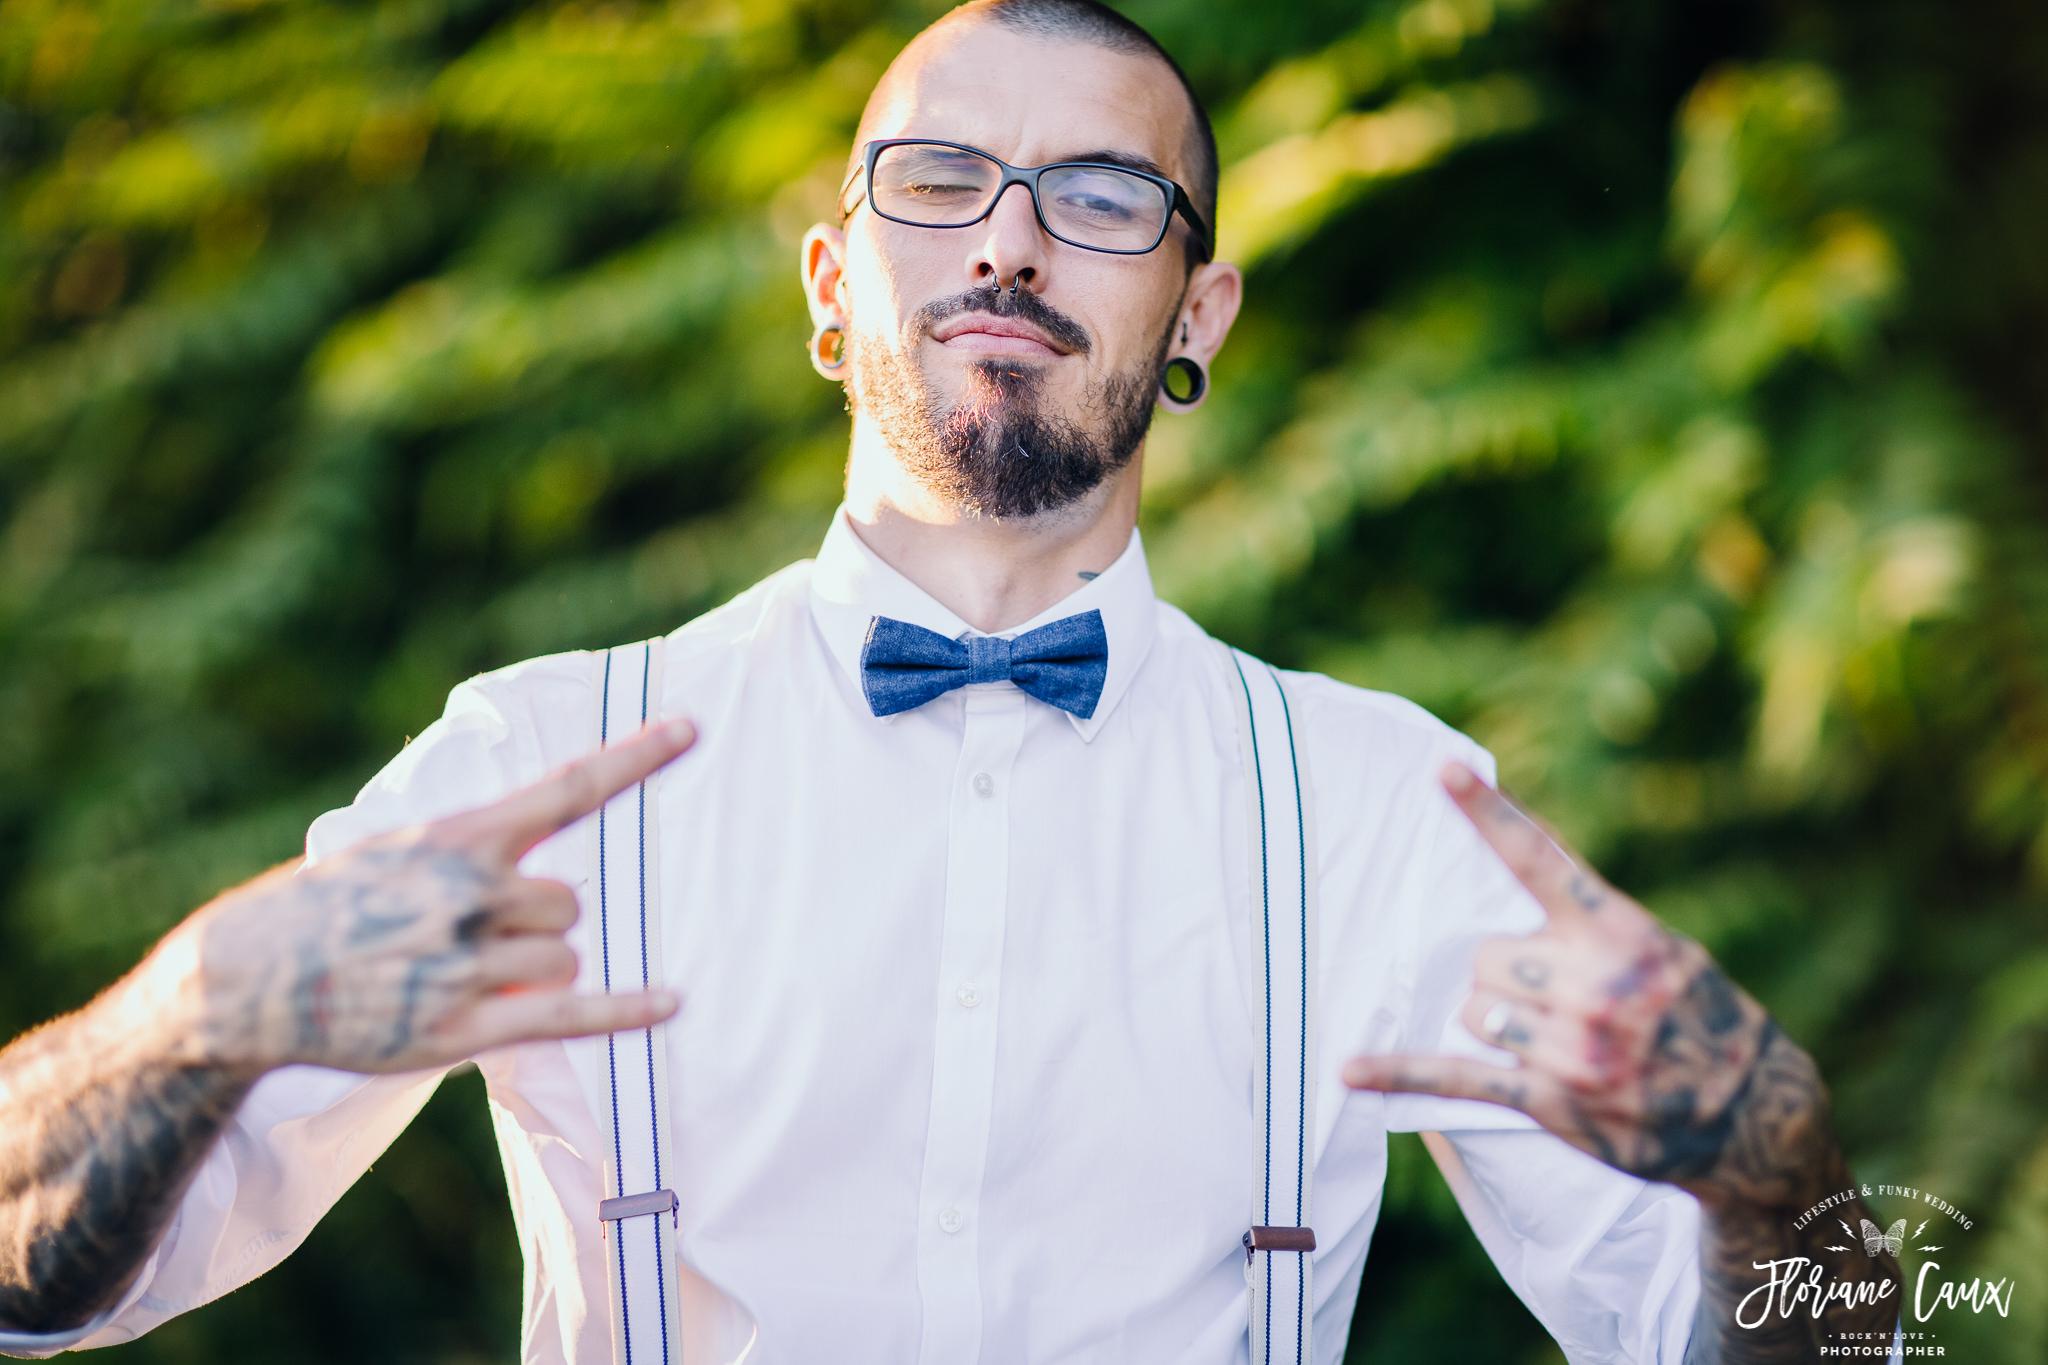 photographe-mariage-toulouse-rocknroll-maries-tatoues-floriane-caux-83